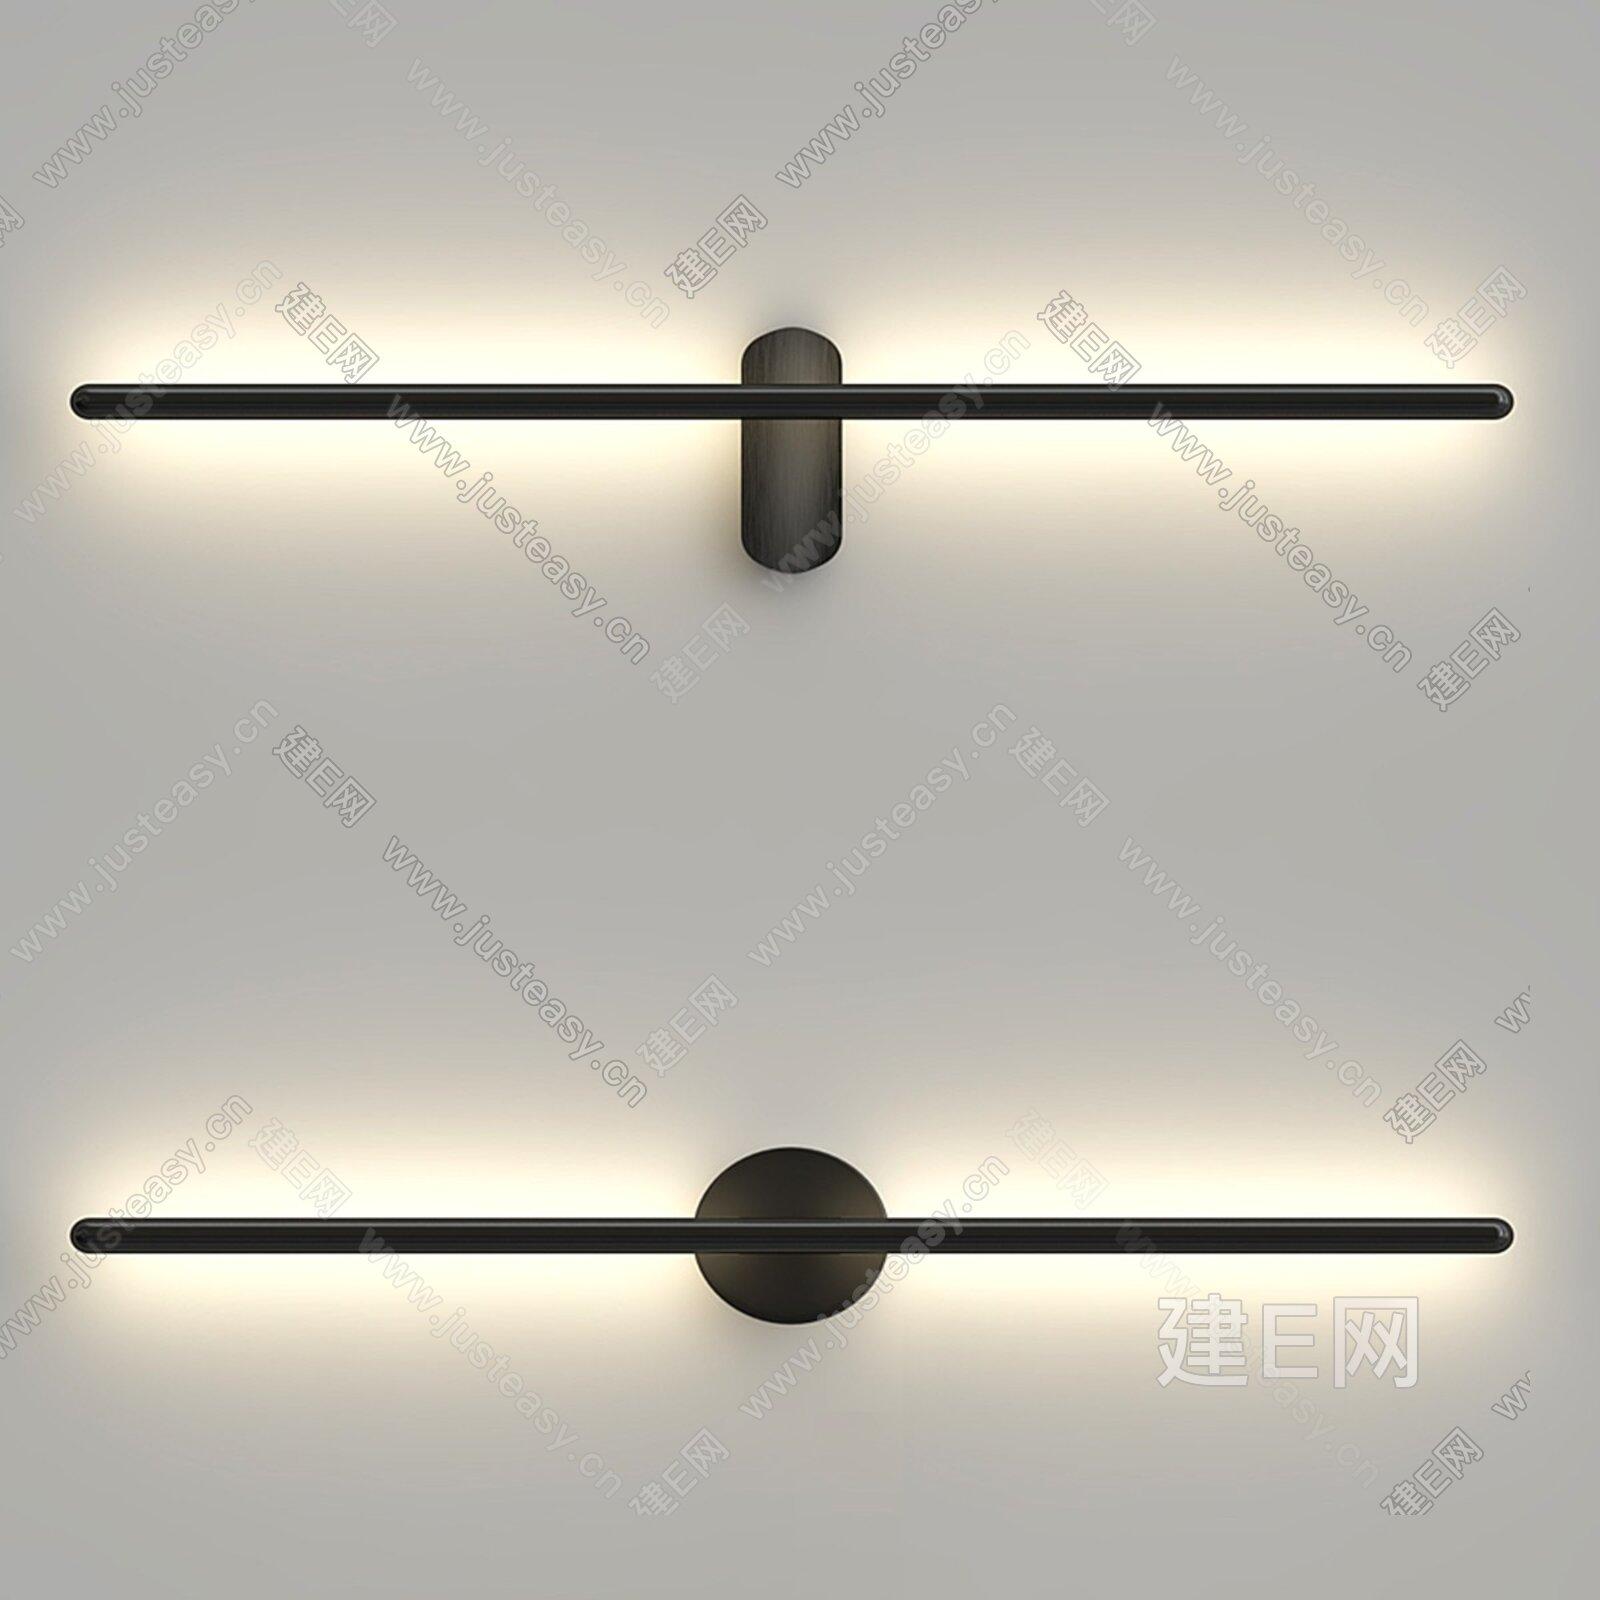 romatti 现代极简壁灯3d模型